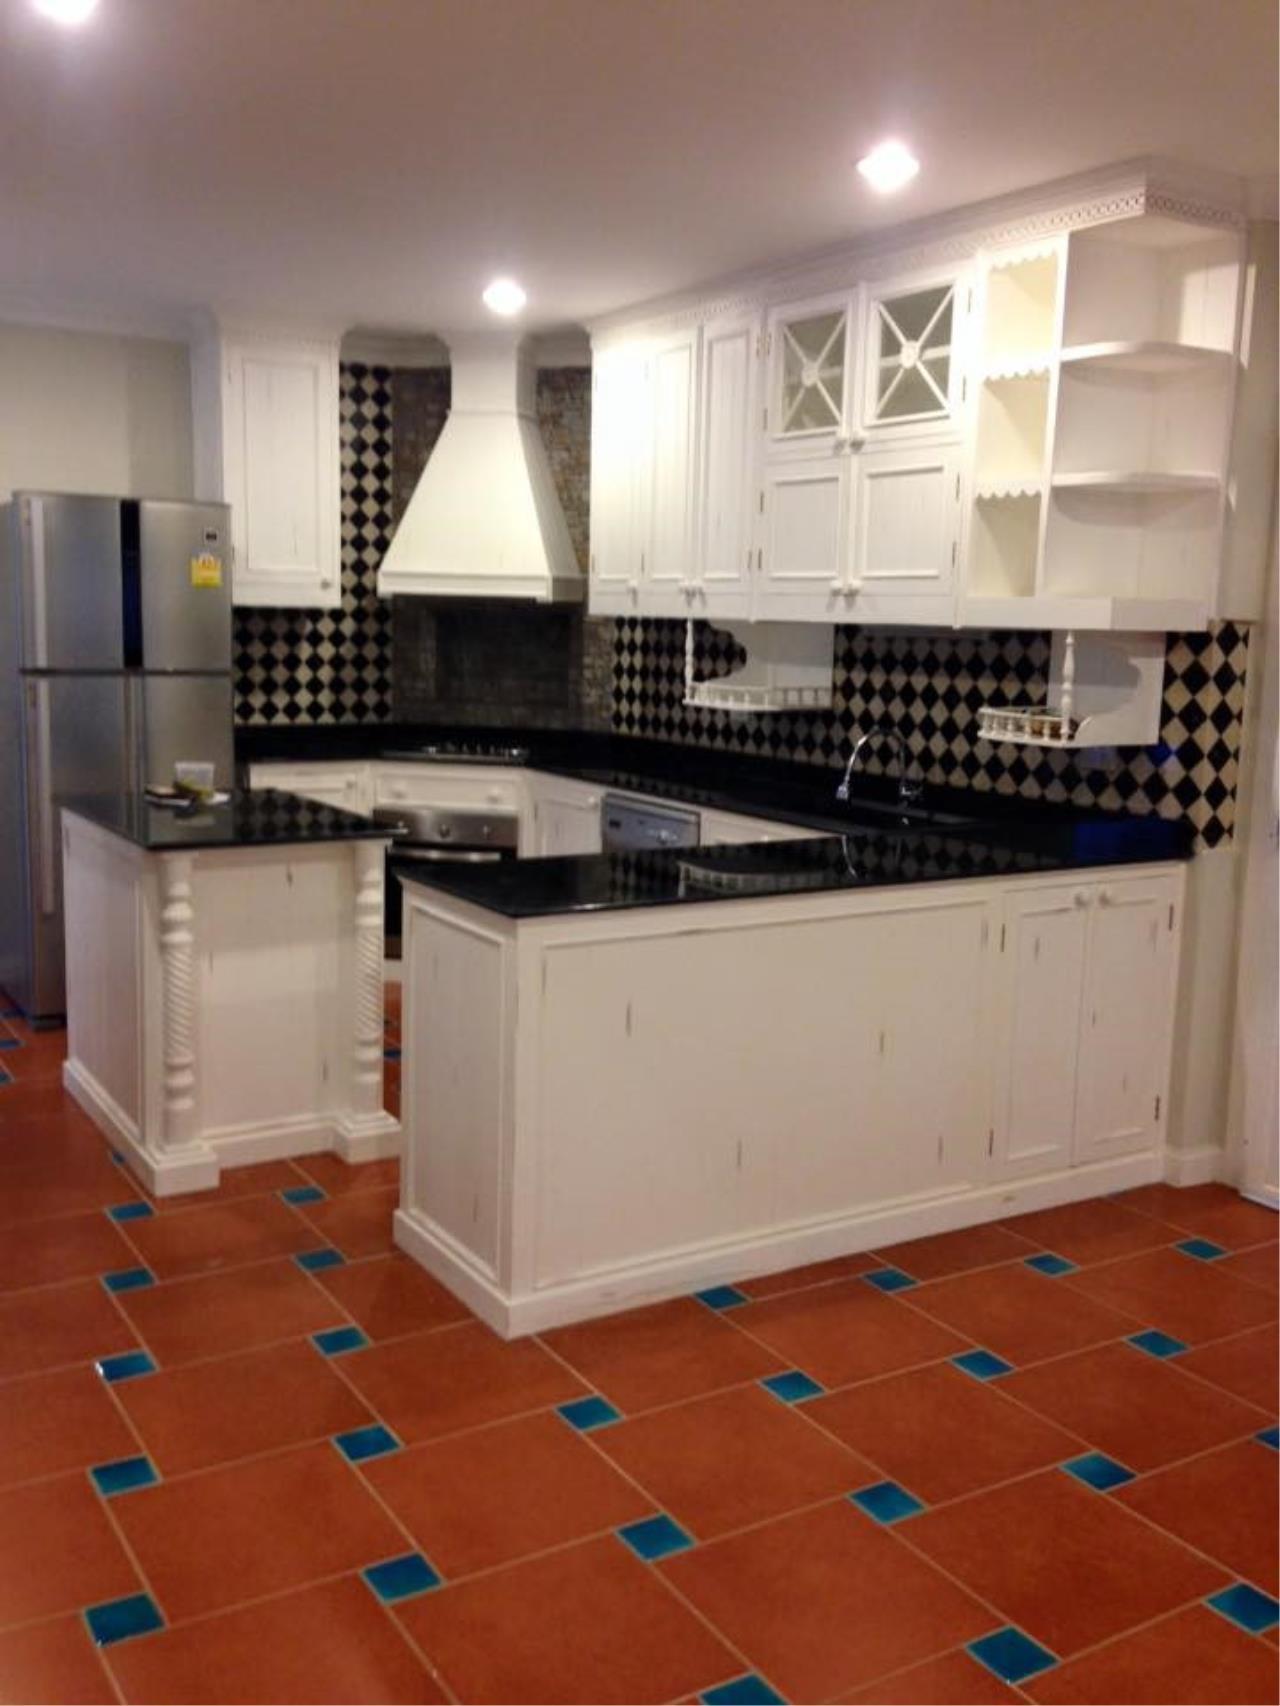 Piri Property Agency's 3 Plus 1 Bedroom Single House for Rent - Fantasia Villa 1